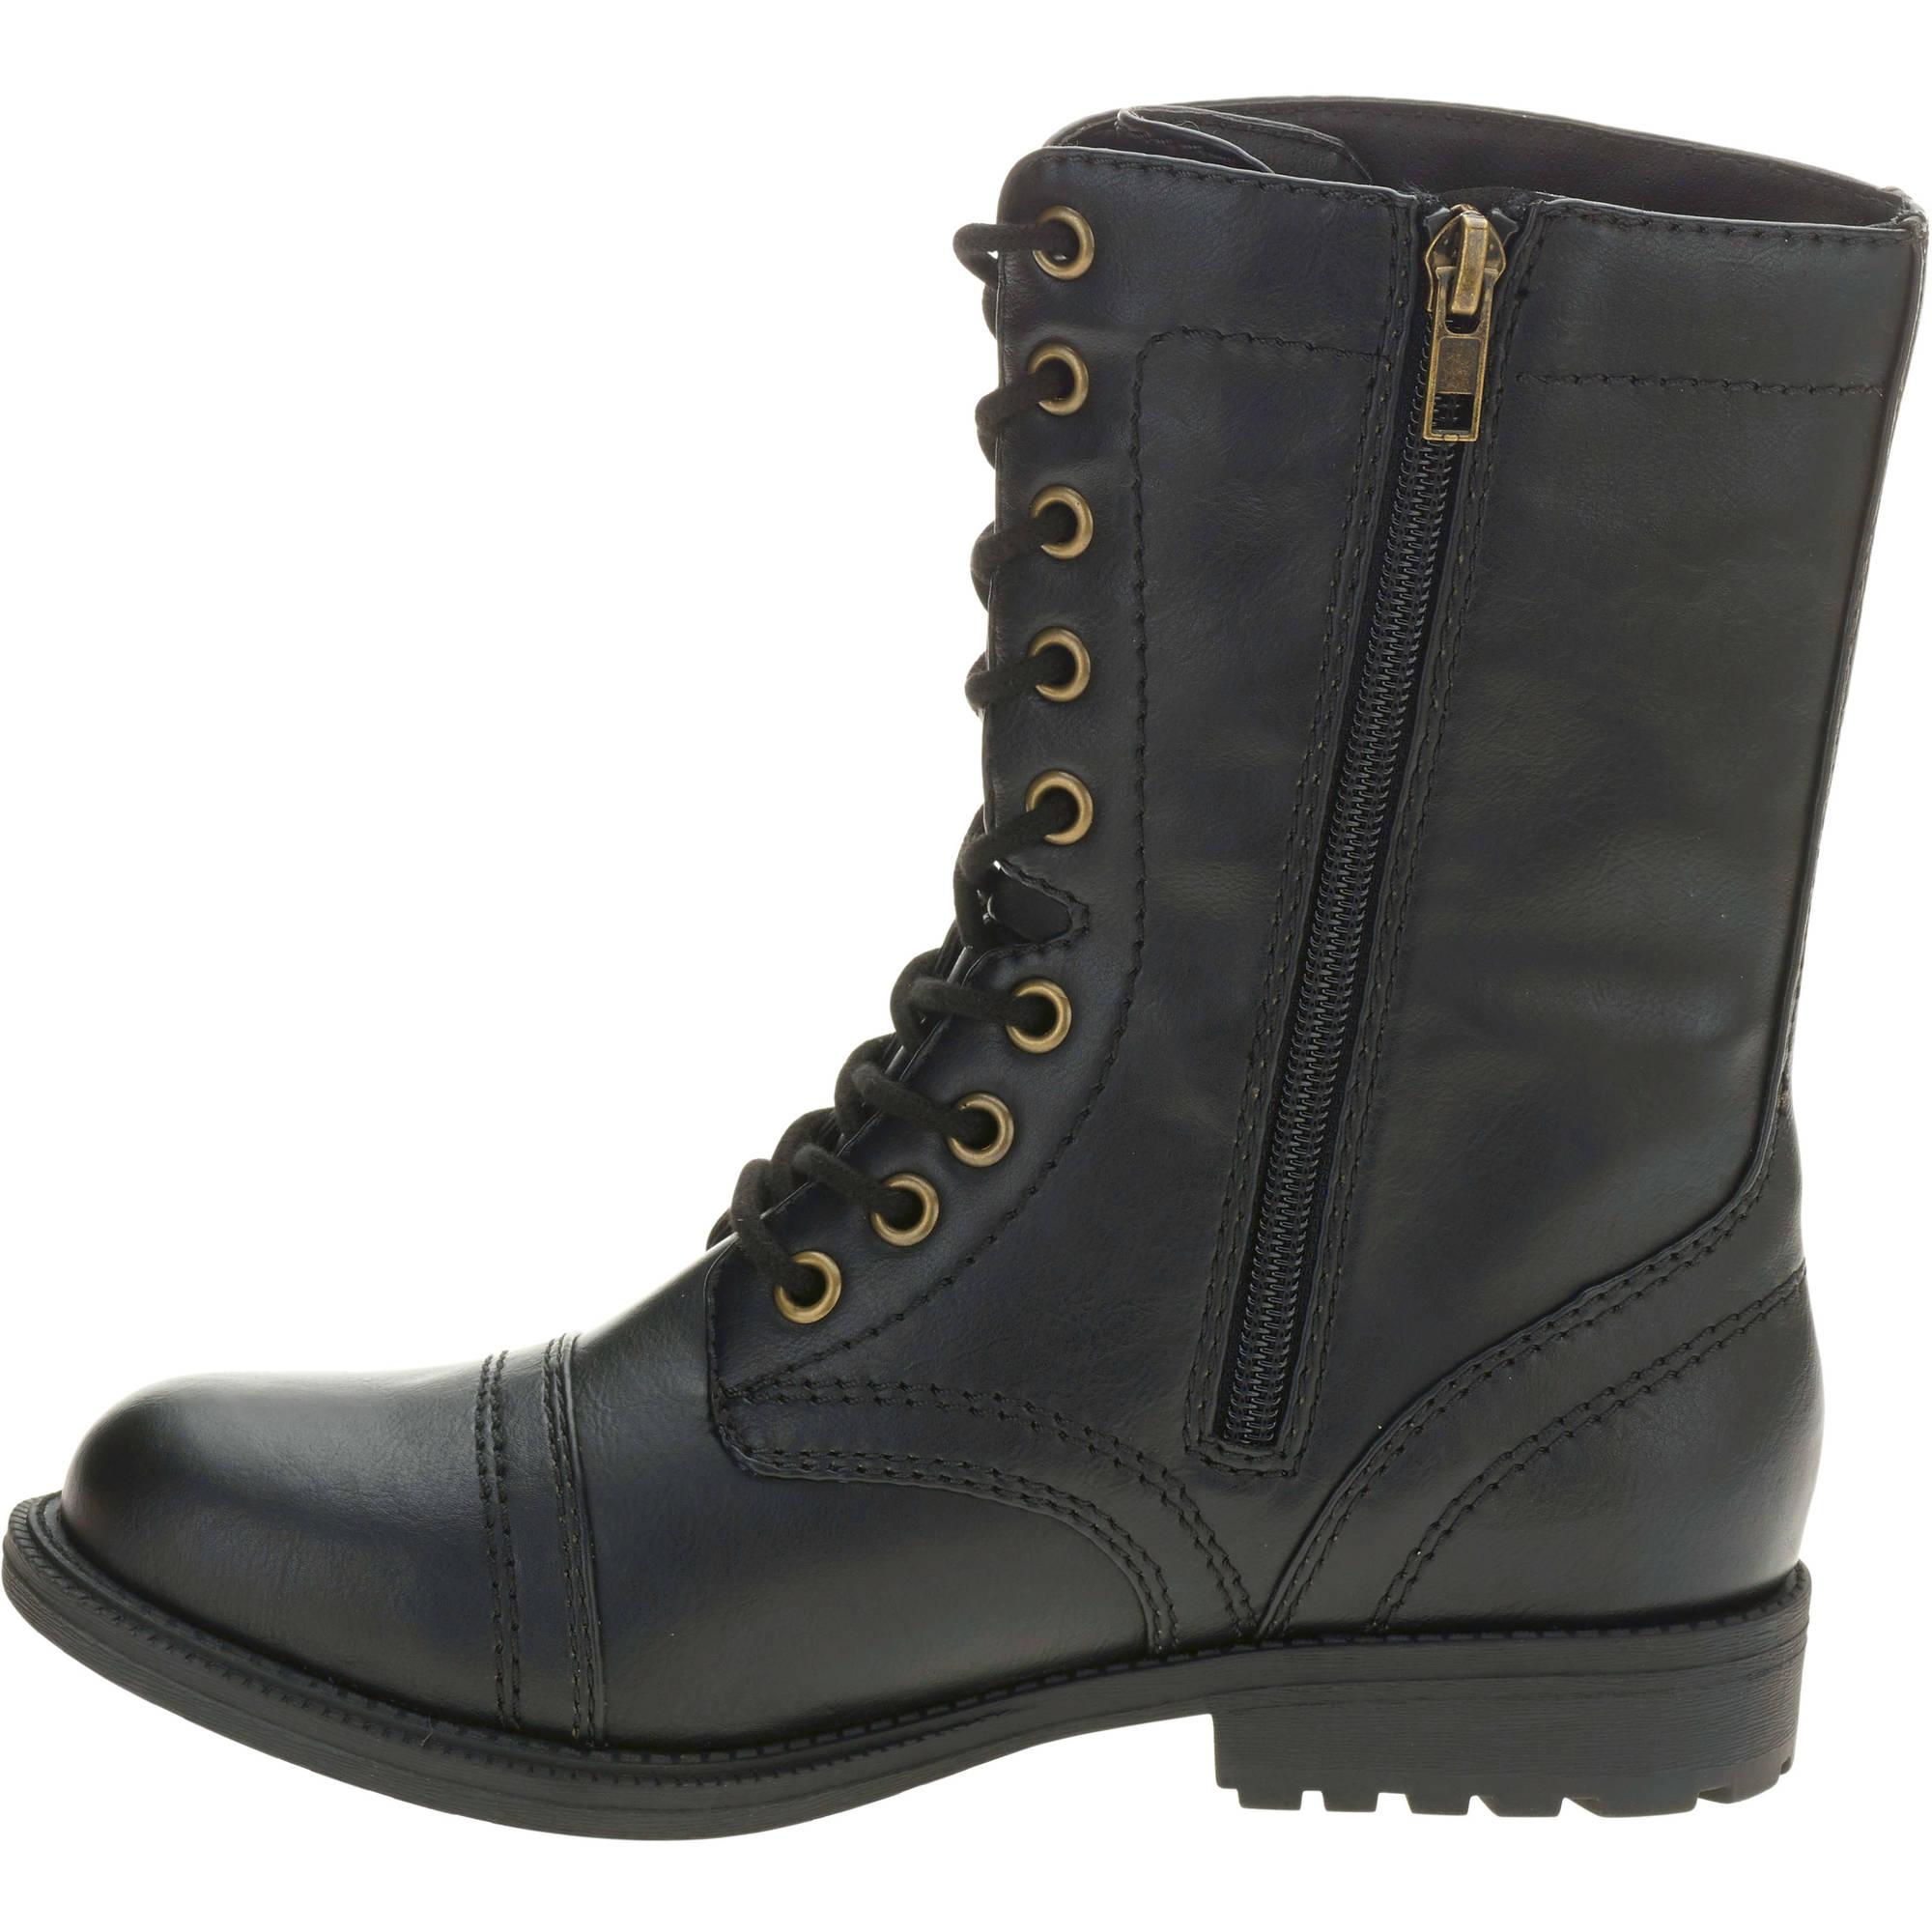 combat boots faded glory womenu0027s combat boot - walmart.com ICYGYEP